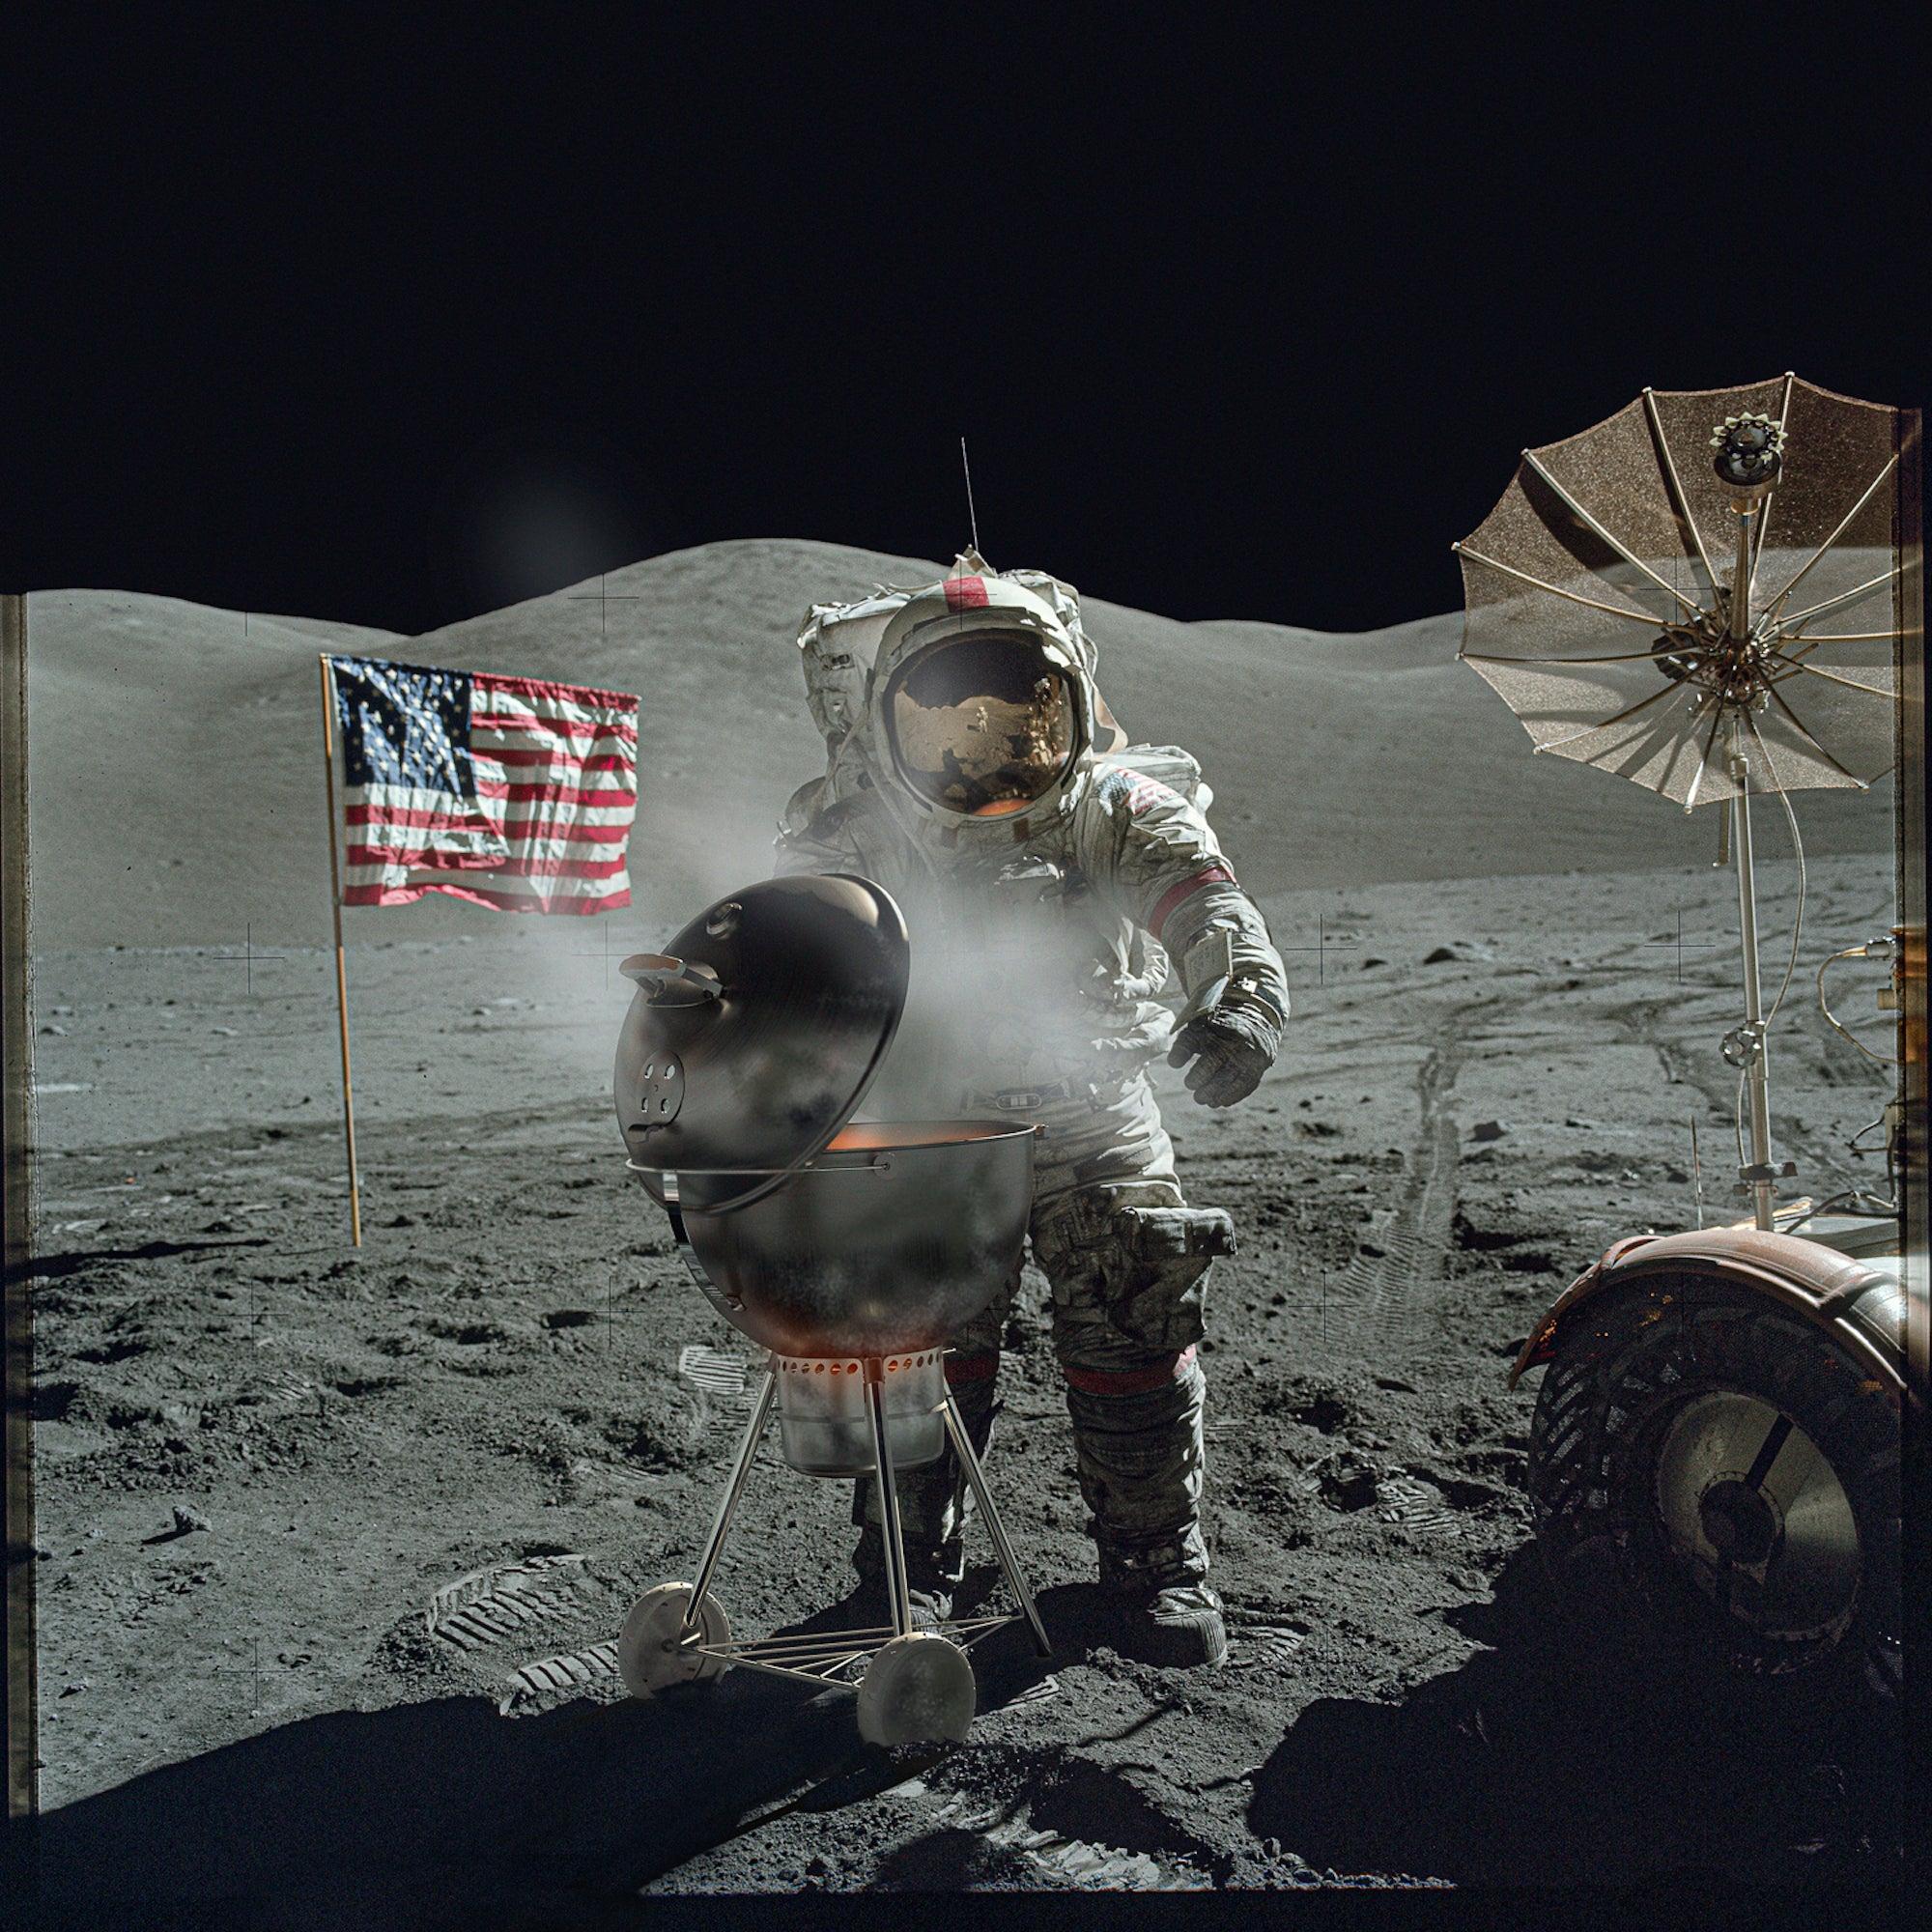 Alpha-Universe-MarkHamiltonGruchy_UnitedKingdom_Professional_Creative_2021.jpg